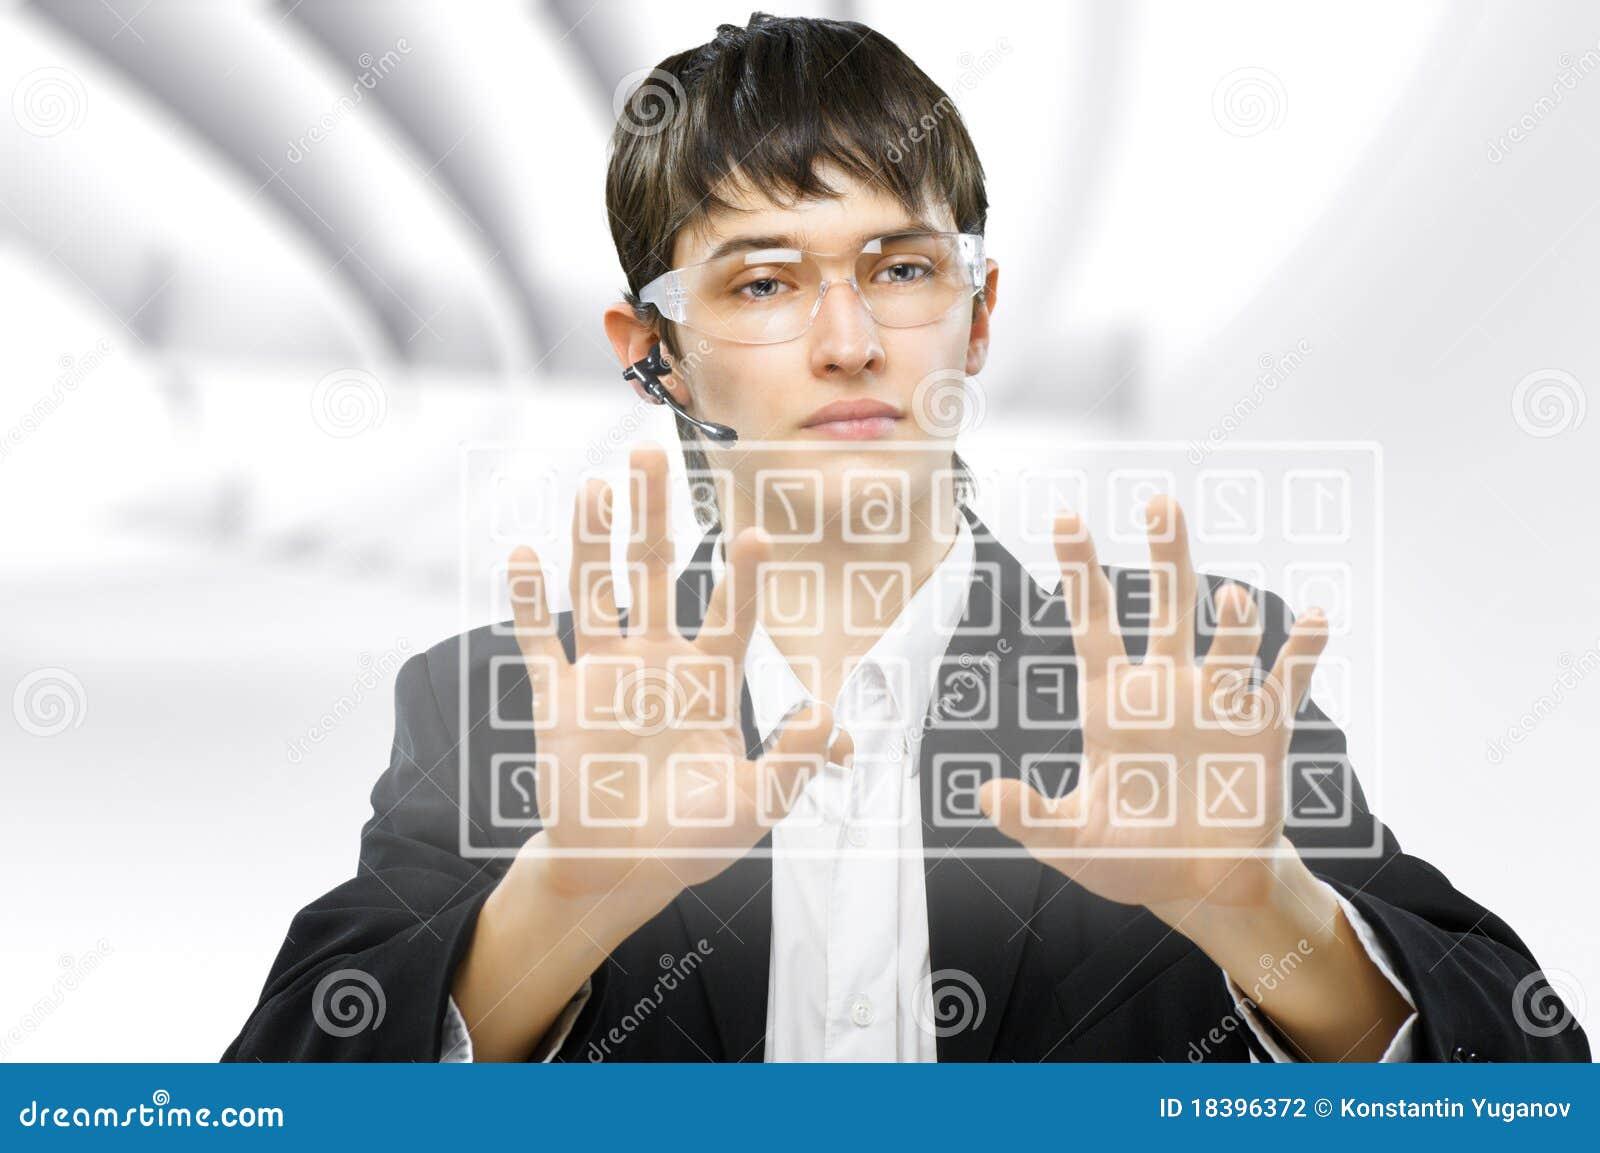 клавиатура фактически